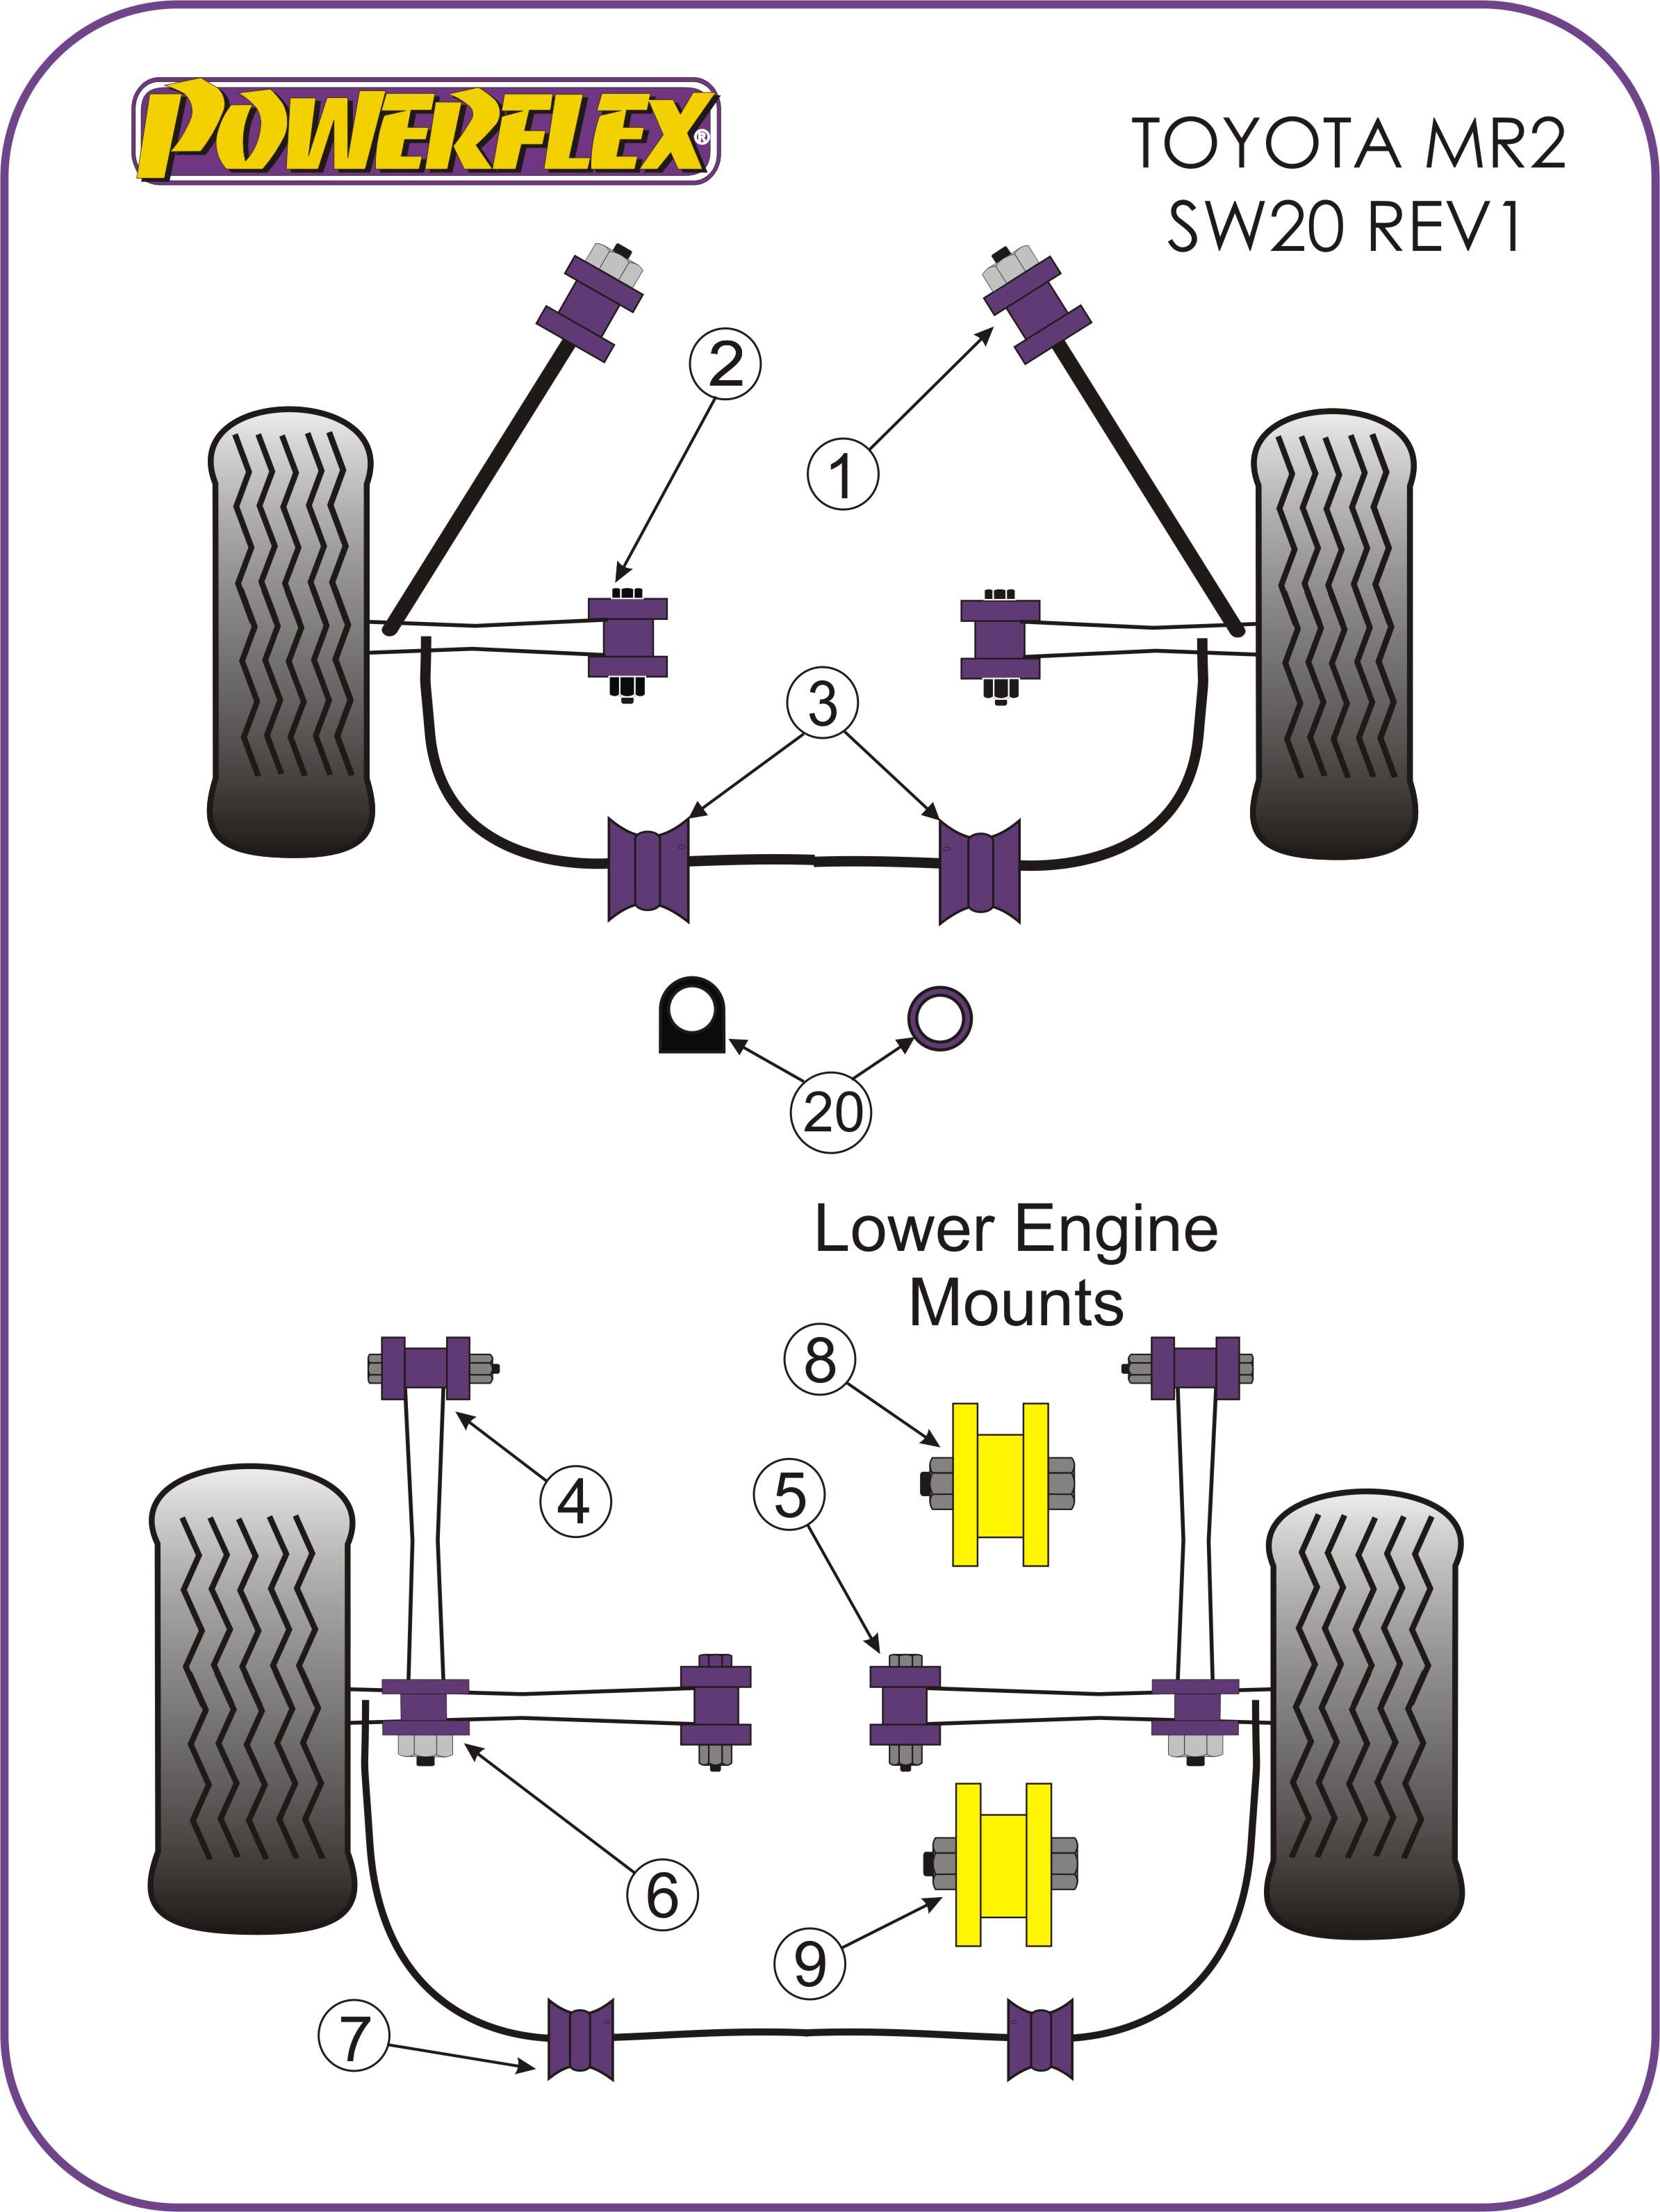 fits TOYOTA MR2 3S-FE//GE SW20 90-99 POWERFLEX REAR RADIUS ARM TO CONTROL ARM BUS